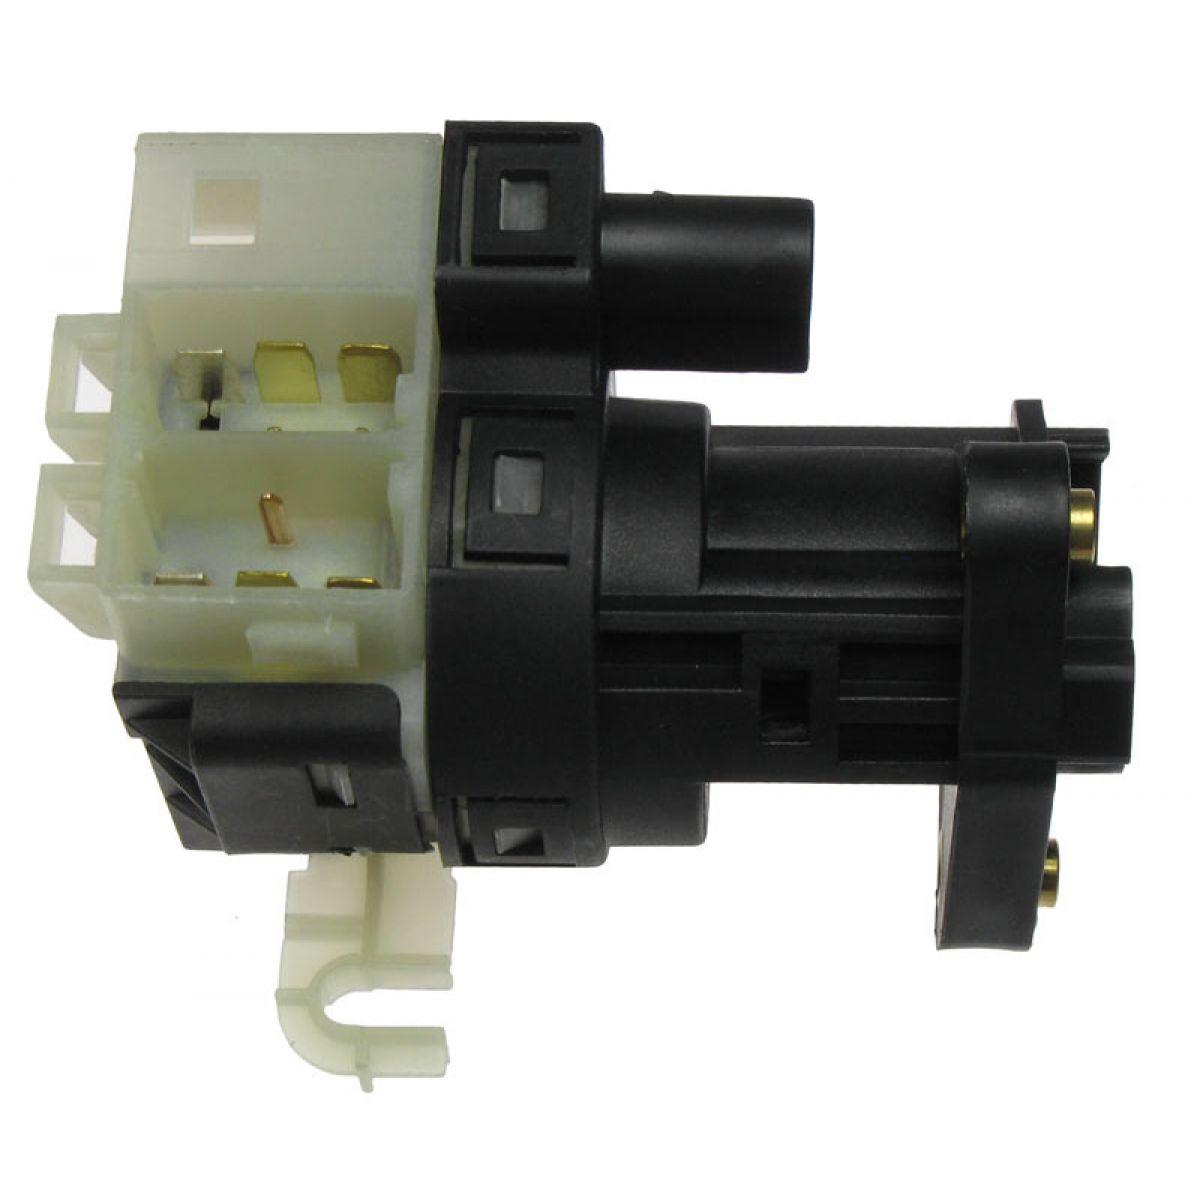 Ignition Starter Electric Switch For Impala Malibu Alero Cutlass Intrigue Grand 192659254566